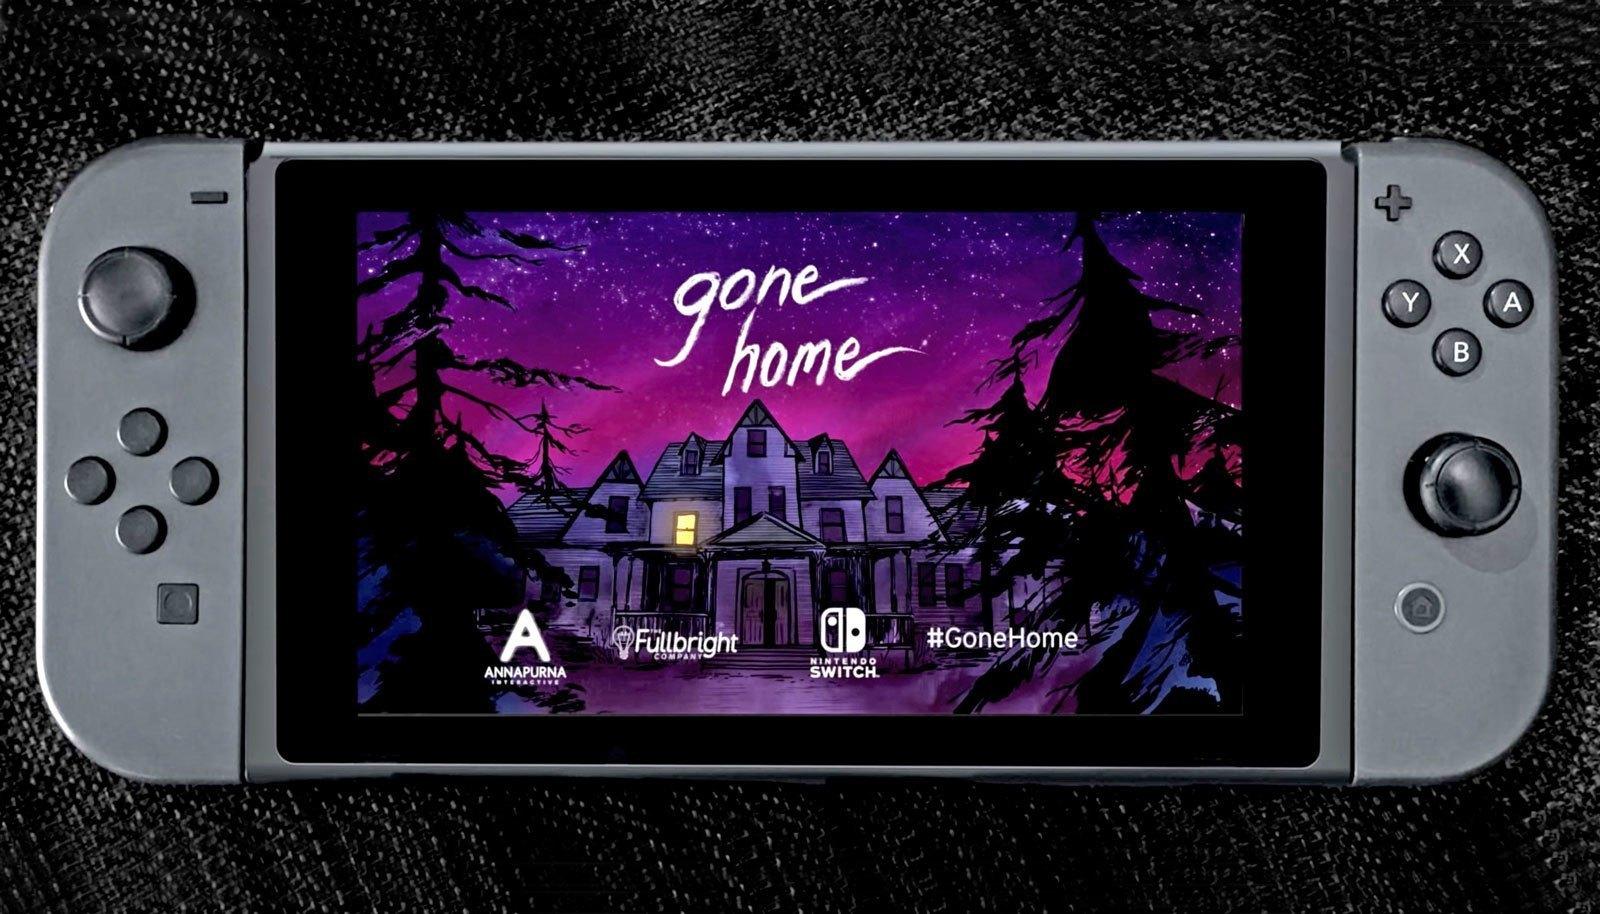 gone home switch.jpg